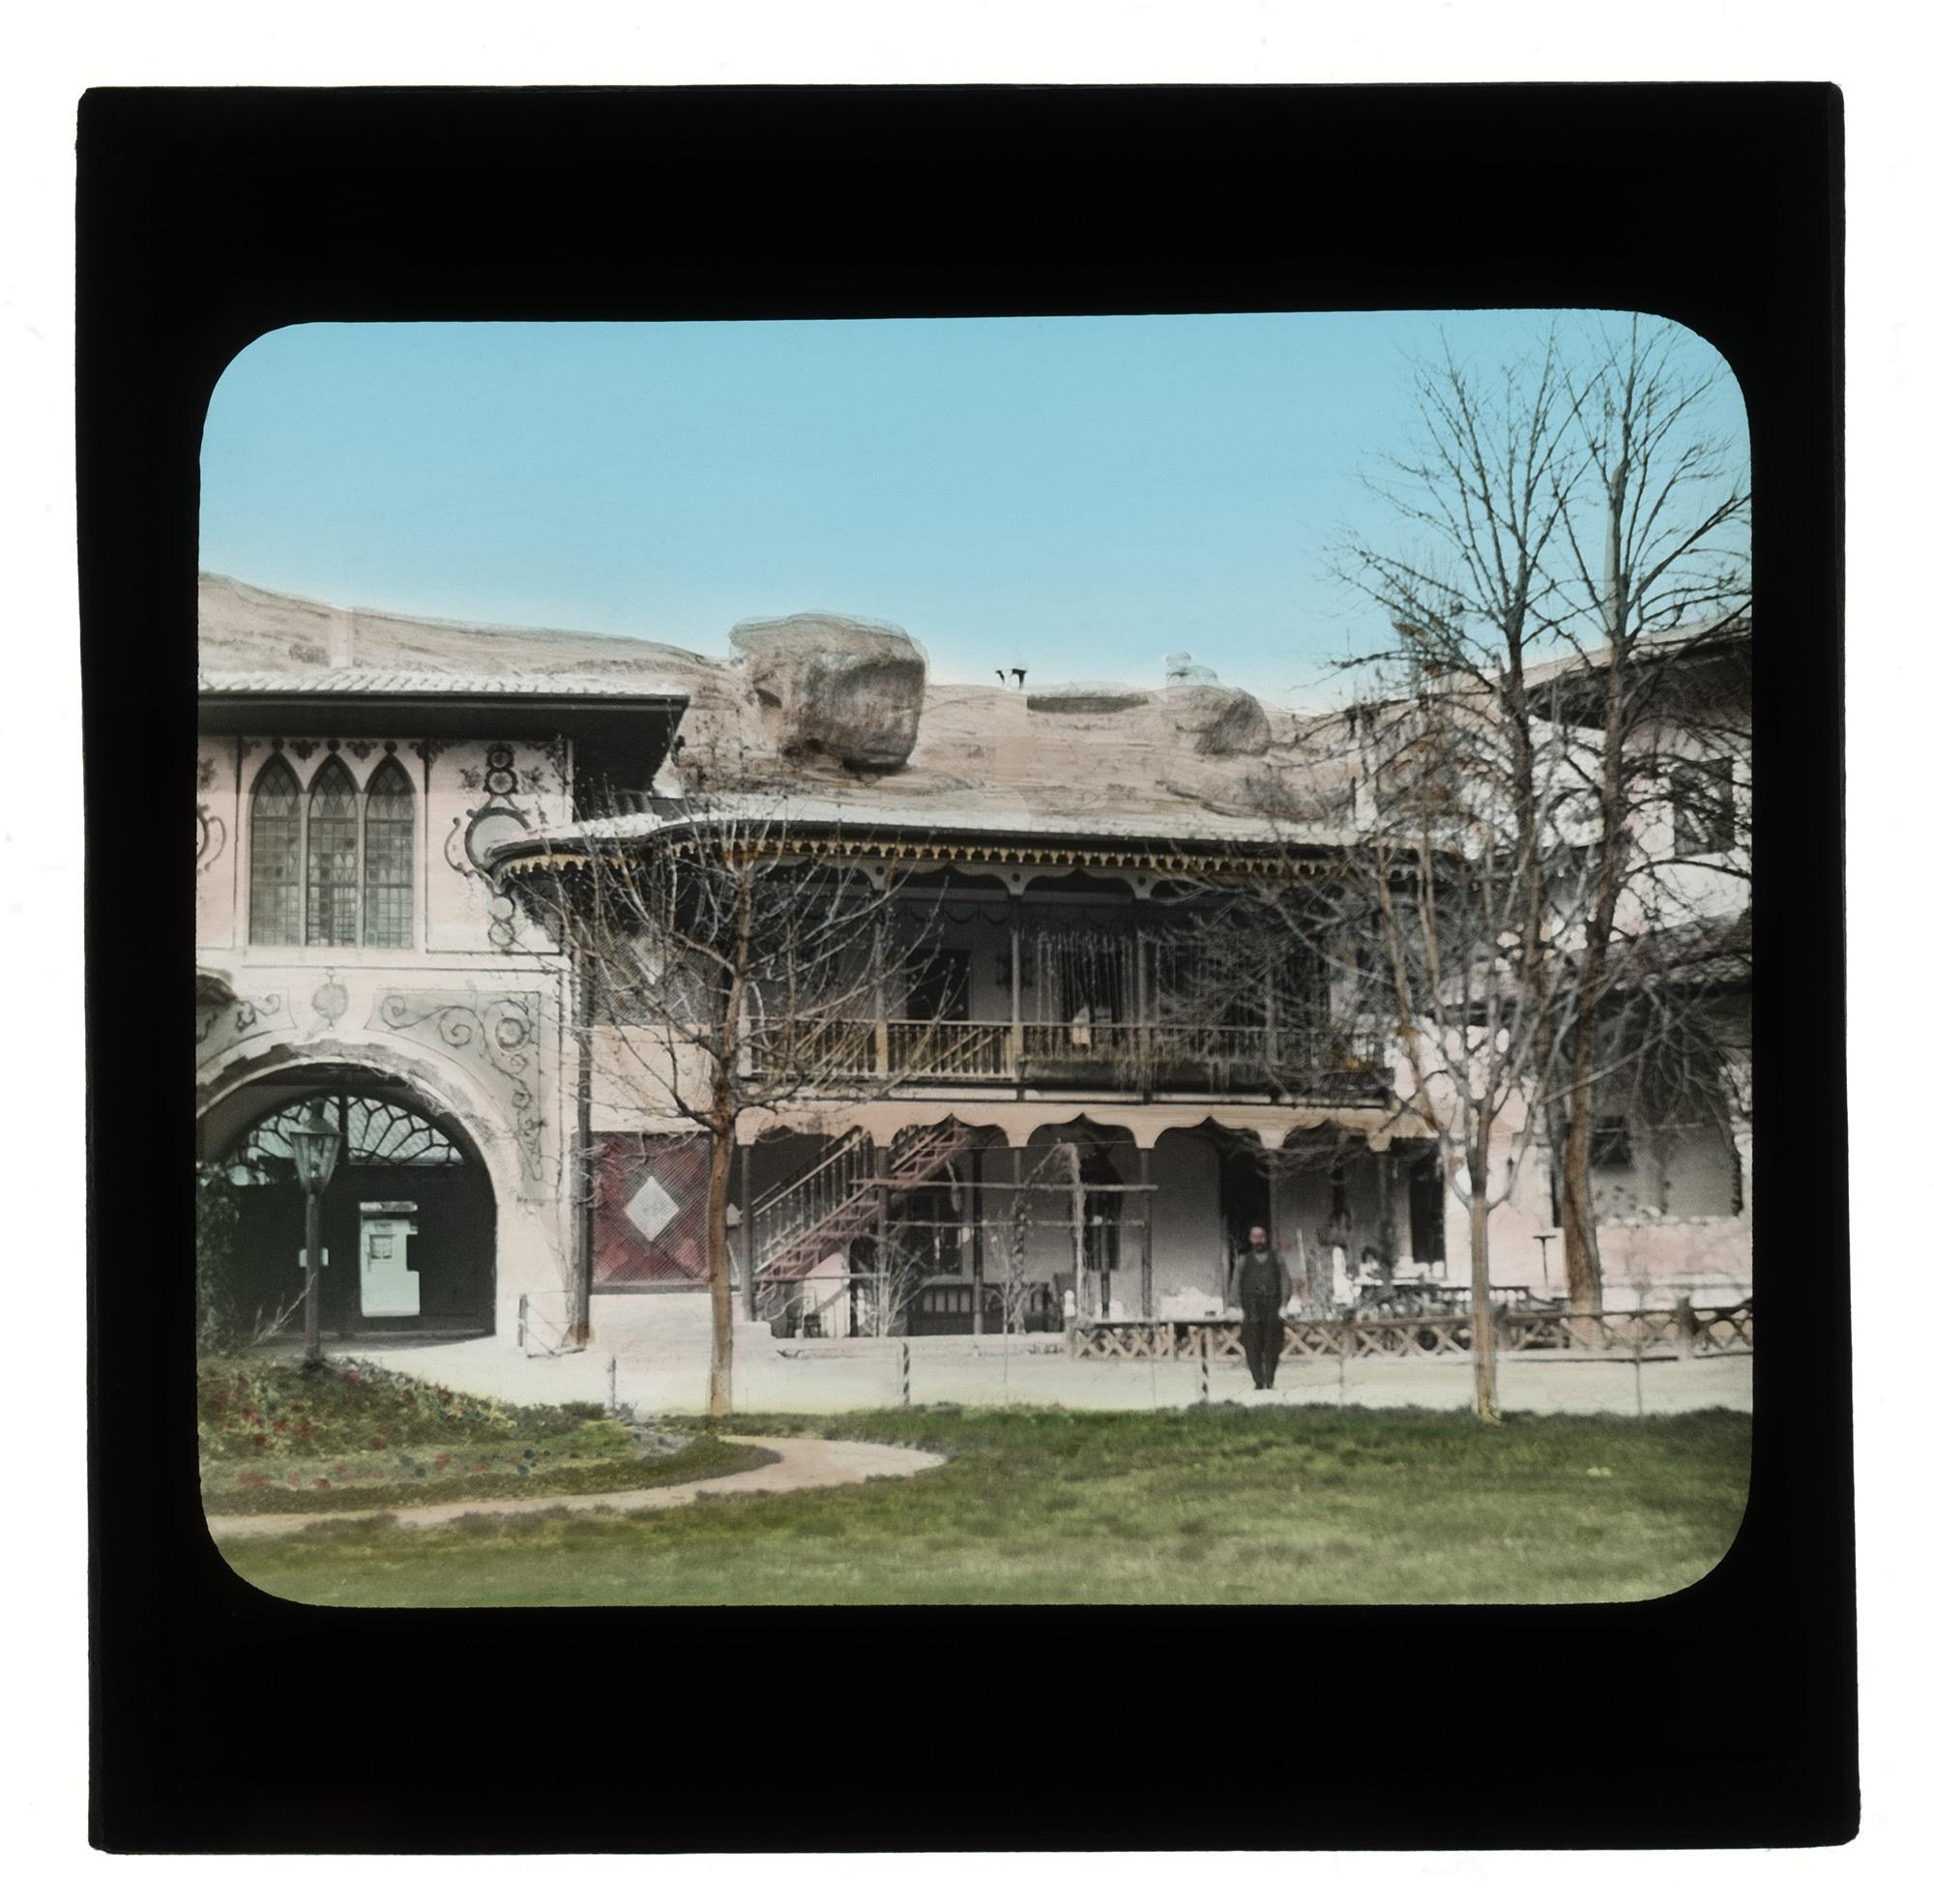 Постройки Ханского дворца в Бахчисарае